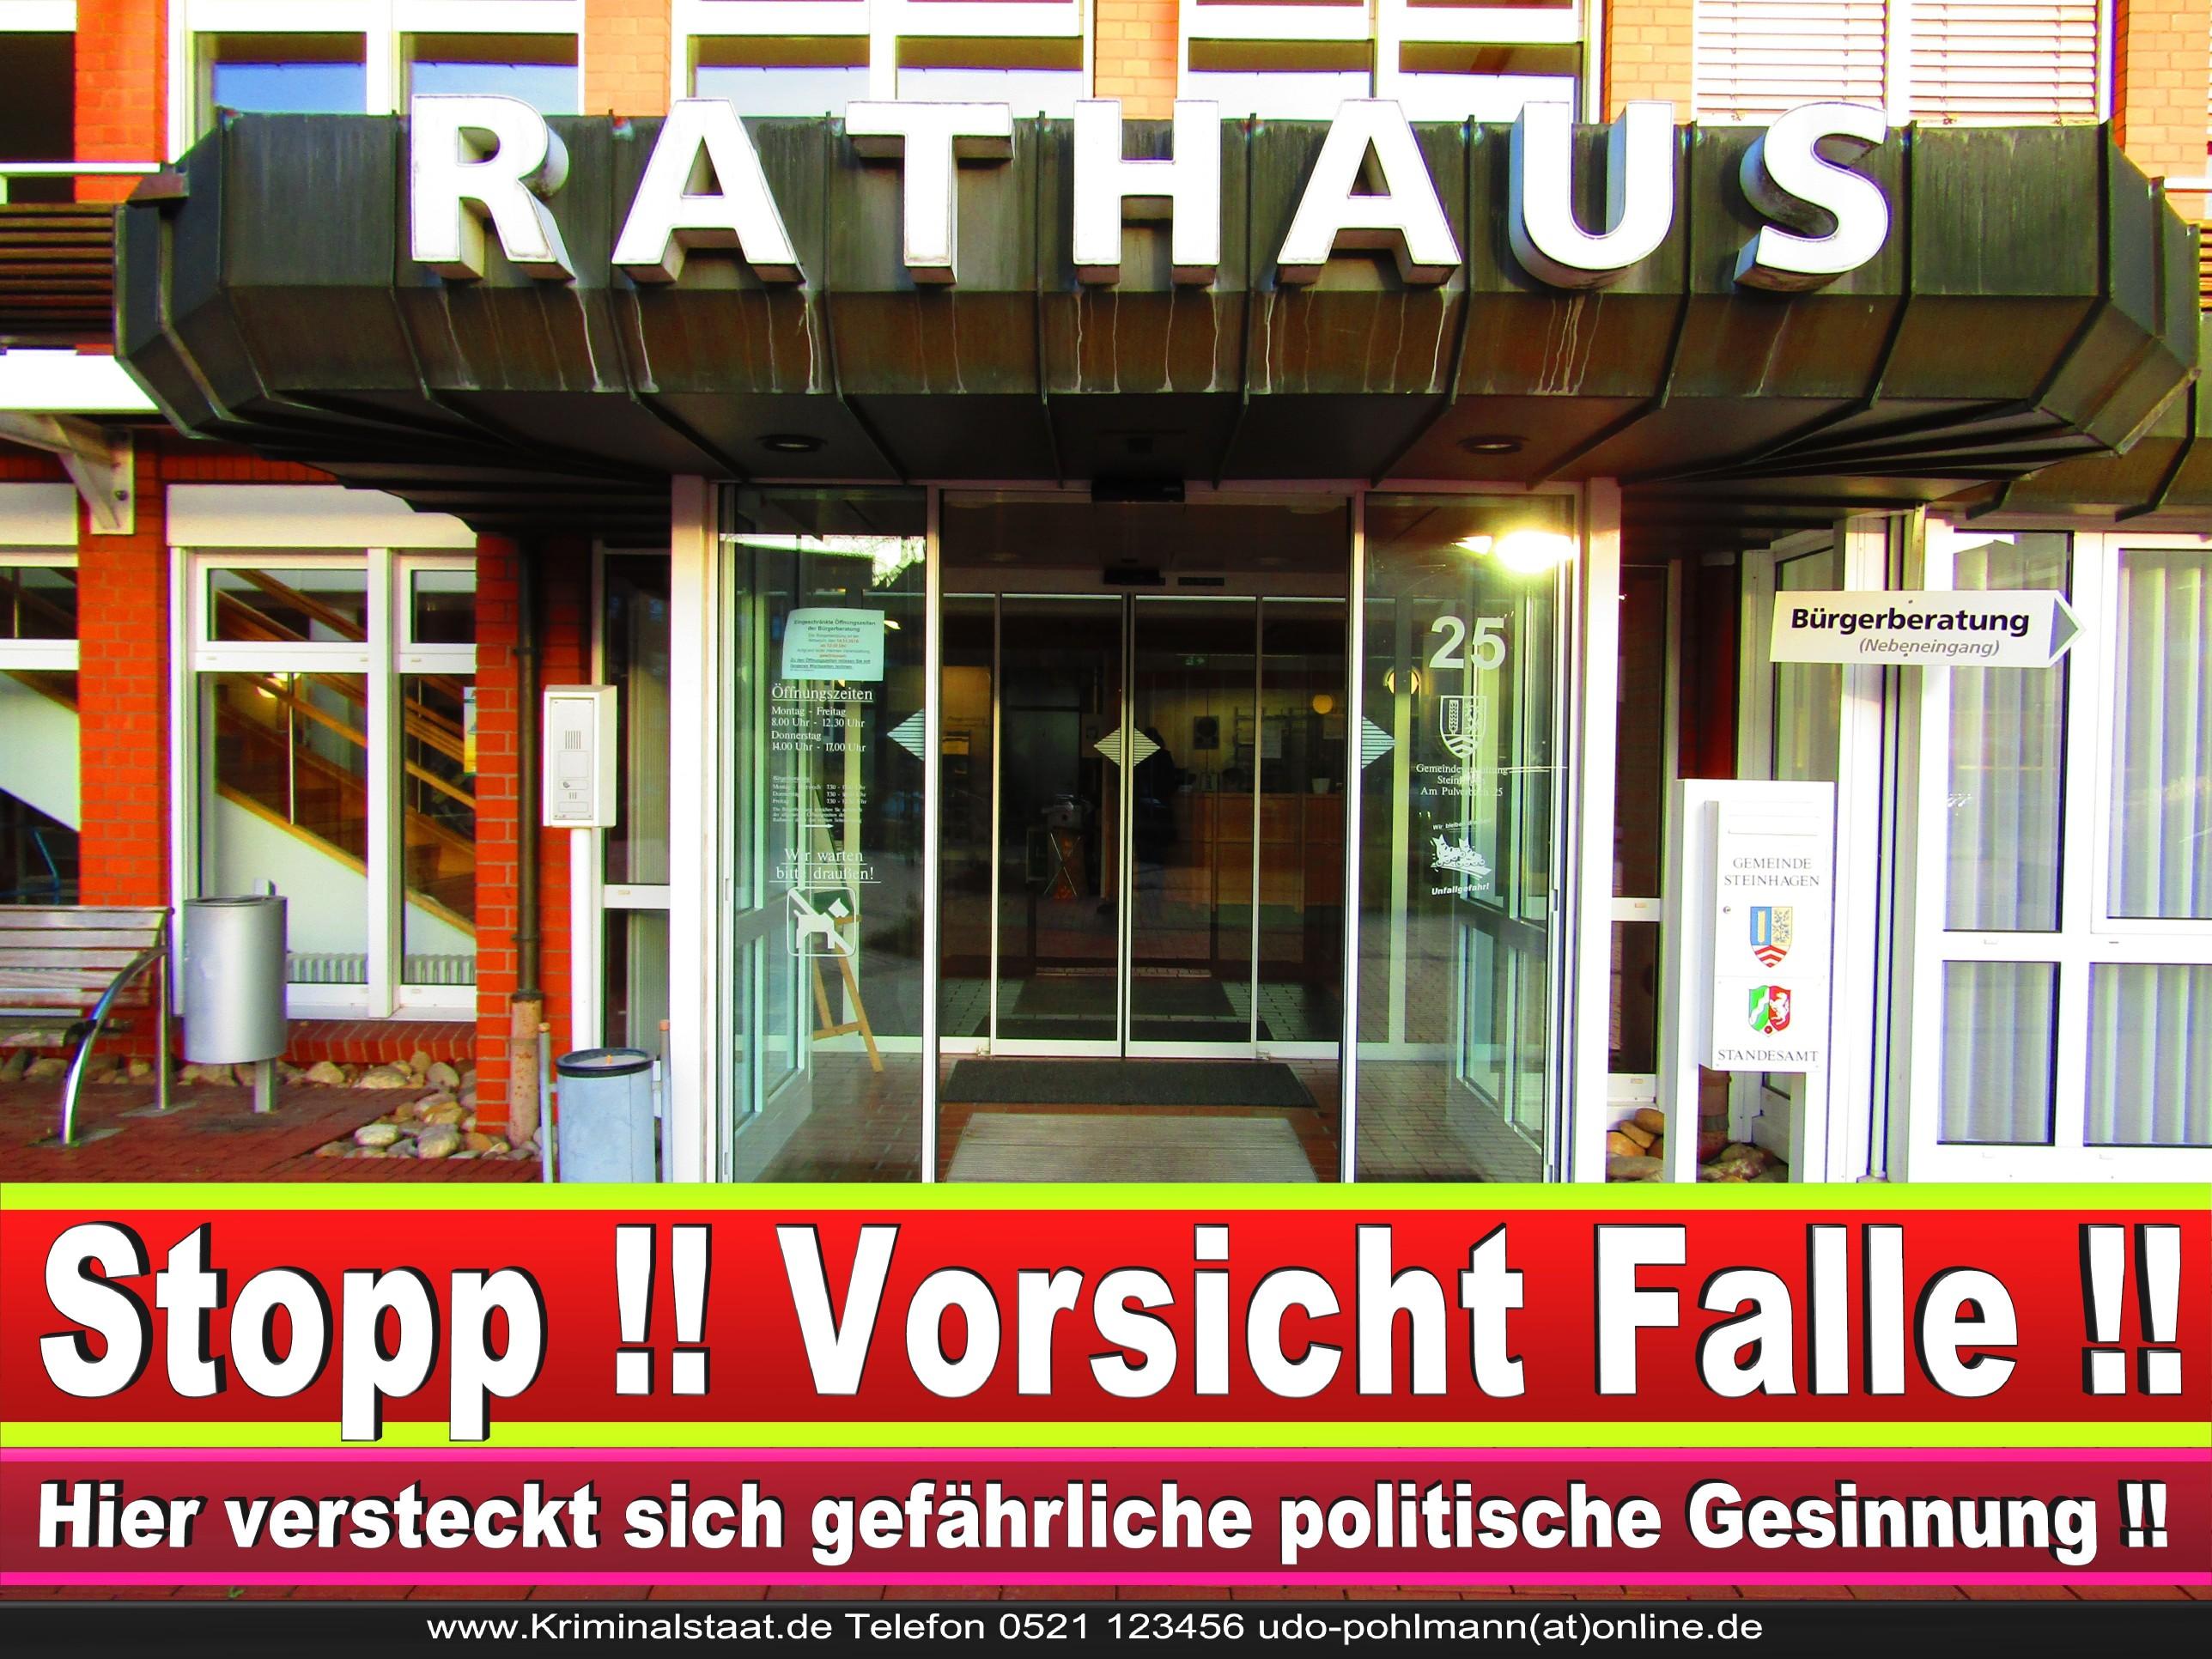 Rathaus Steinhagen CDU SPD FDP Ortsverband CDU Bürgerbüro CDU SPD Korruption Polizei Bürgermeister Karte Telefonbuch NRW OWL (15)